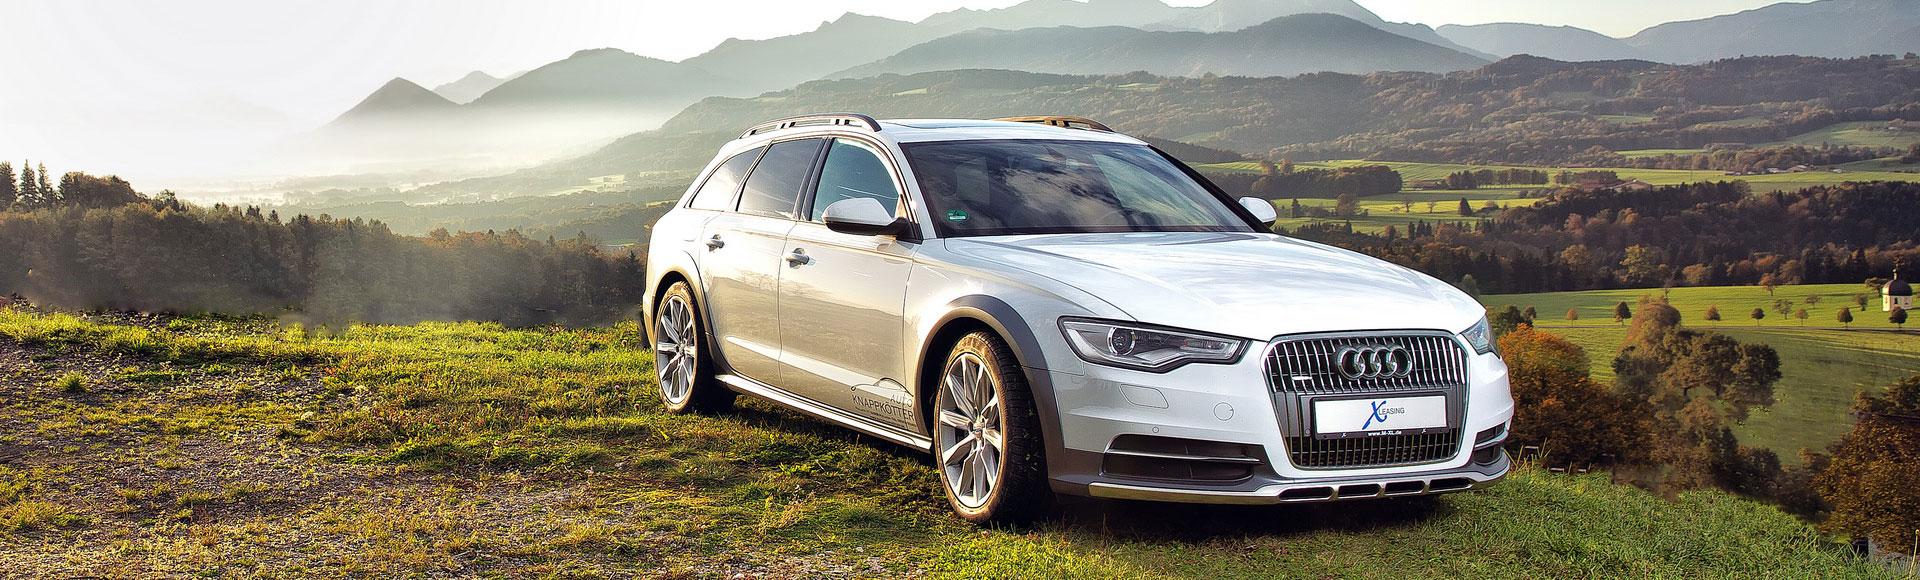 Audi A6 Allroad 2014 Herbst 3791